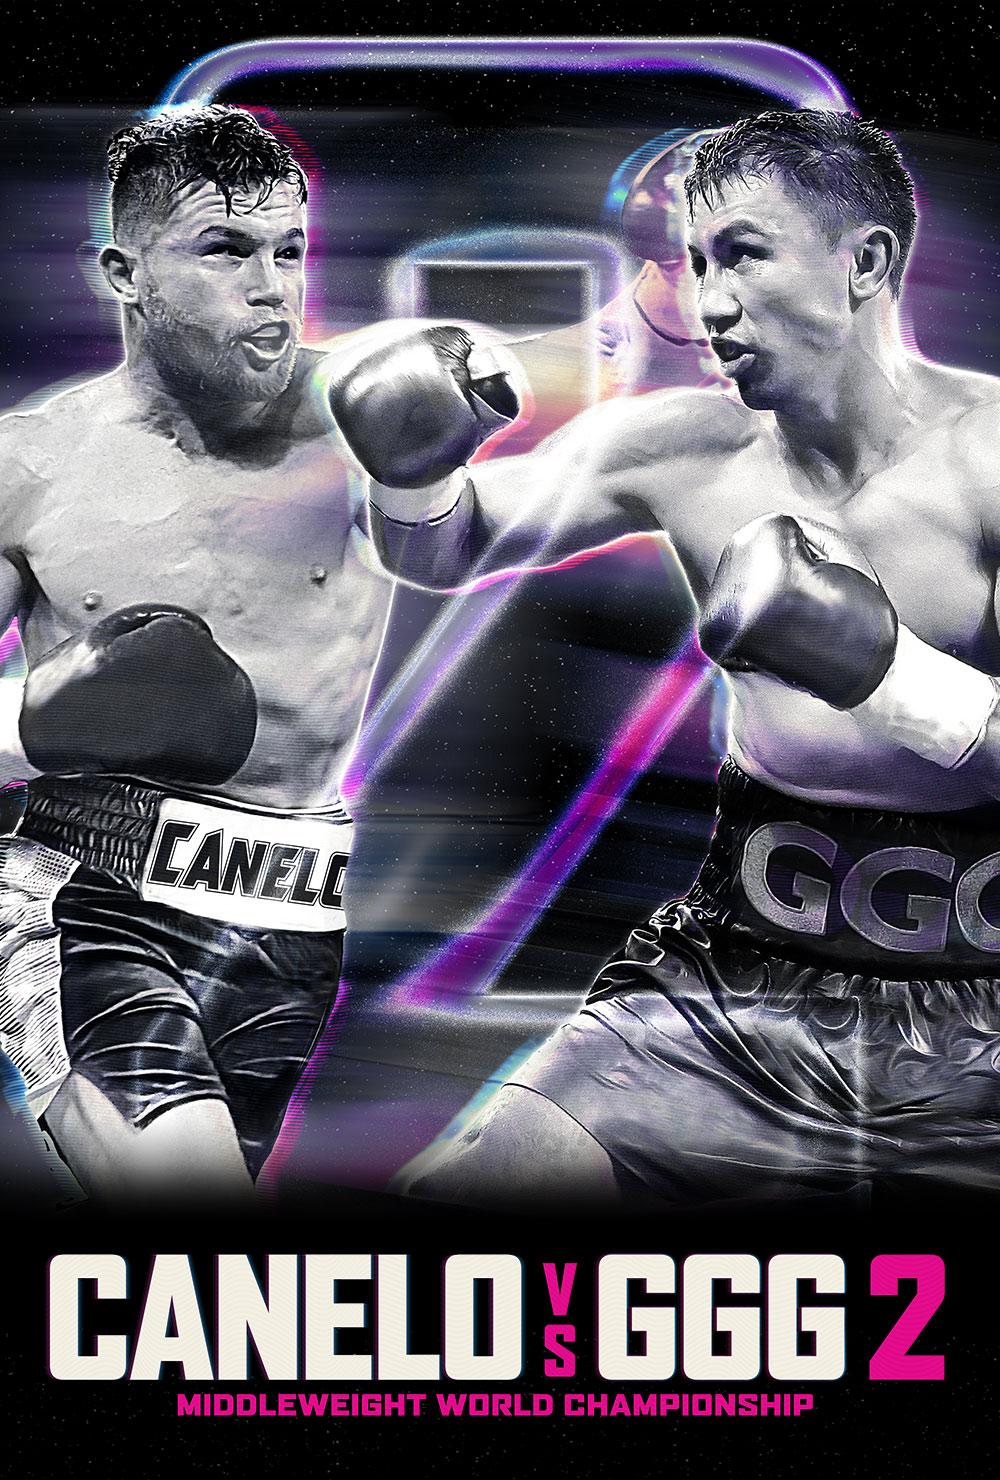 Canelo vs. GGG 2